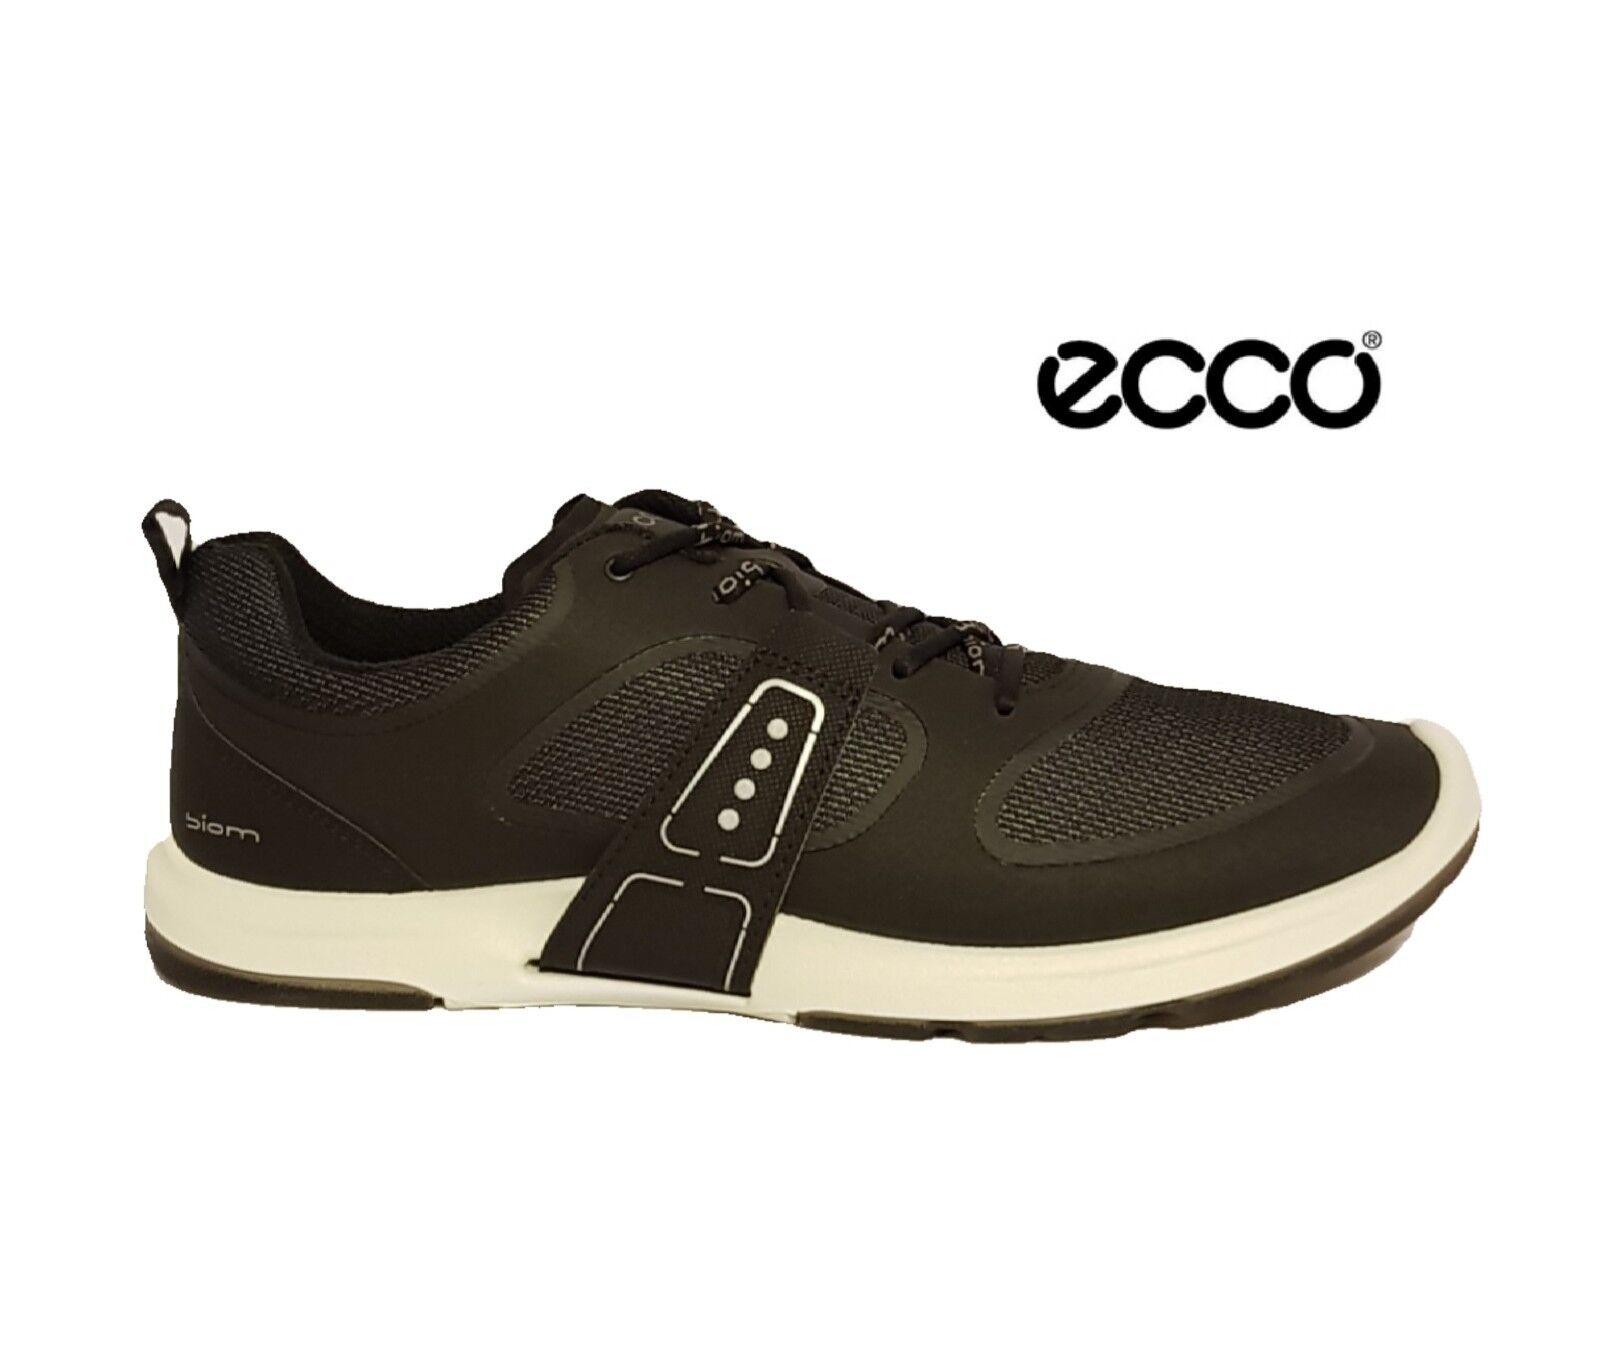 ECCO BIOM AMRAP BLACK TRAINERS RUNNING Schuhe SNEAKERS Damenschuhe LADIES UK 7 EU 40